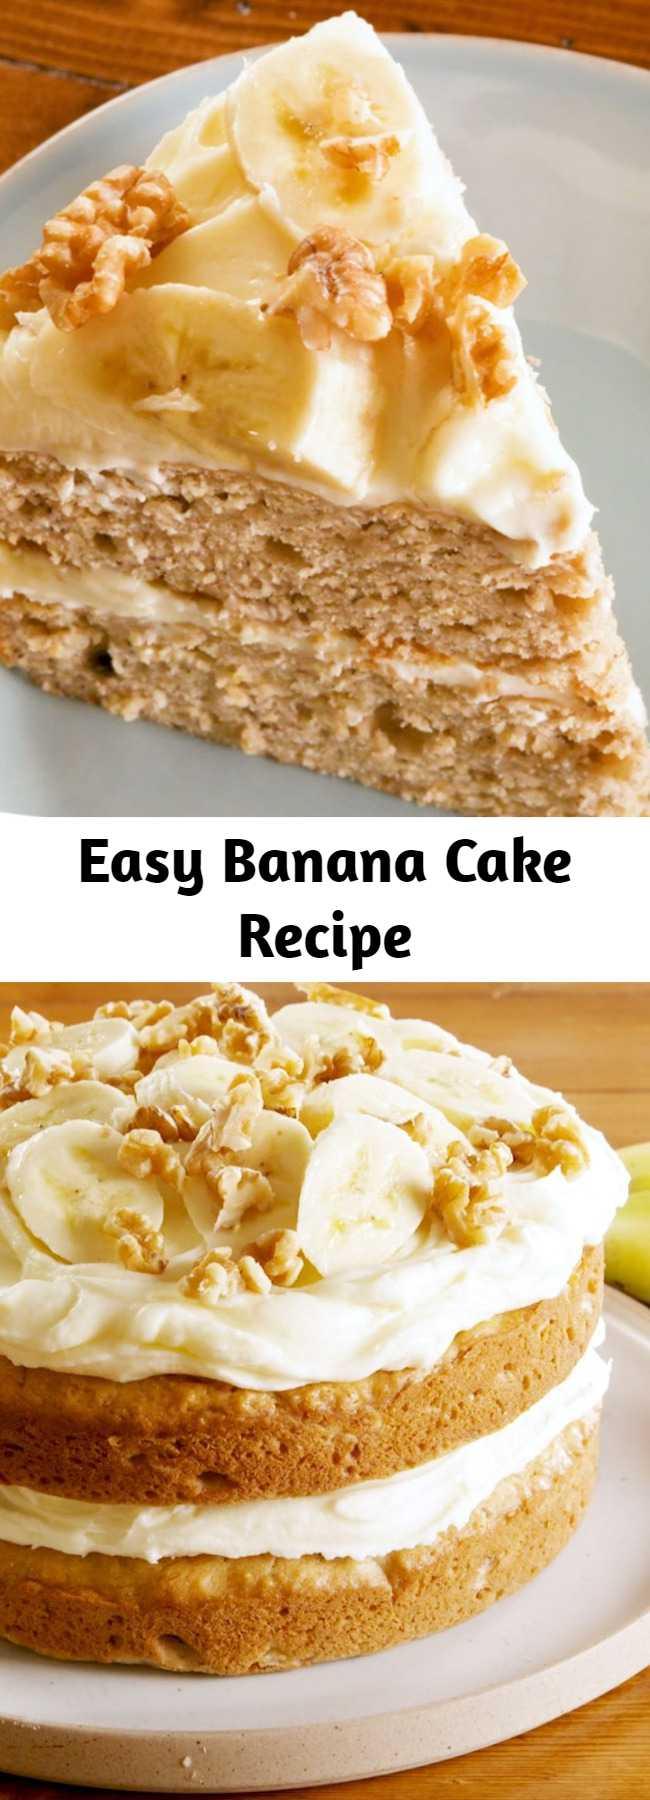 Easy Banana Cake Recipe - You can't go wrong with this Banana Cake recipe.